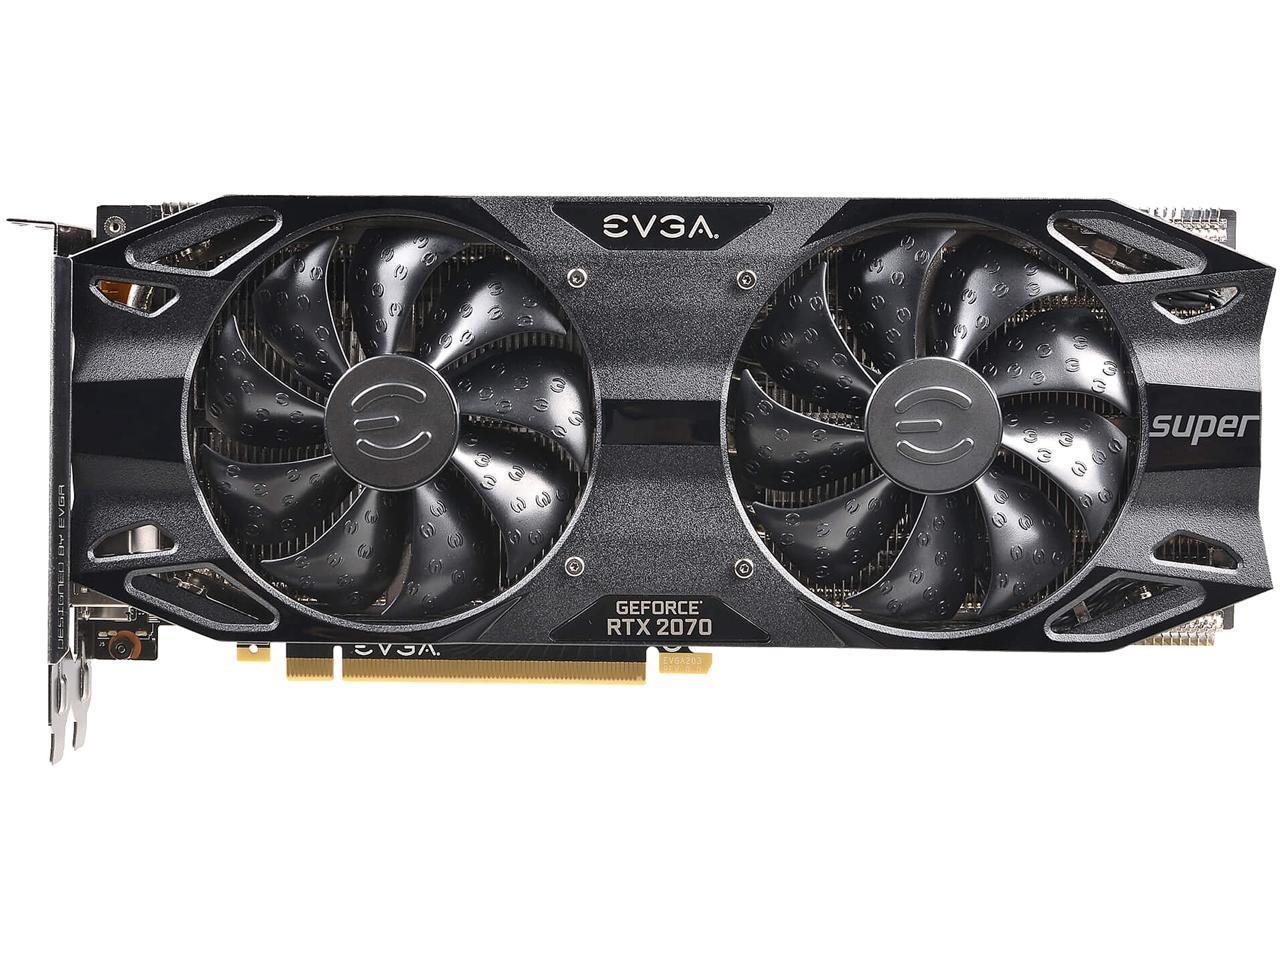 EVGA GeForce RTX 2070 Super Black 8GB - $469.99 AR ($489.99 before rebate)